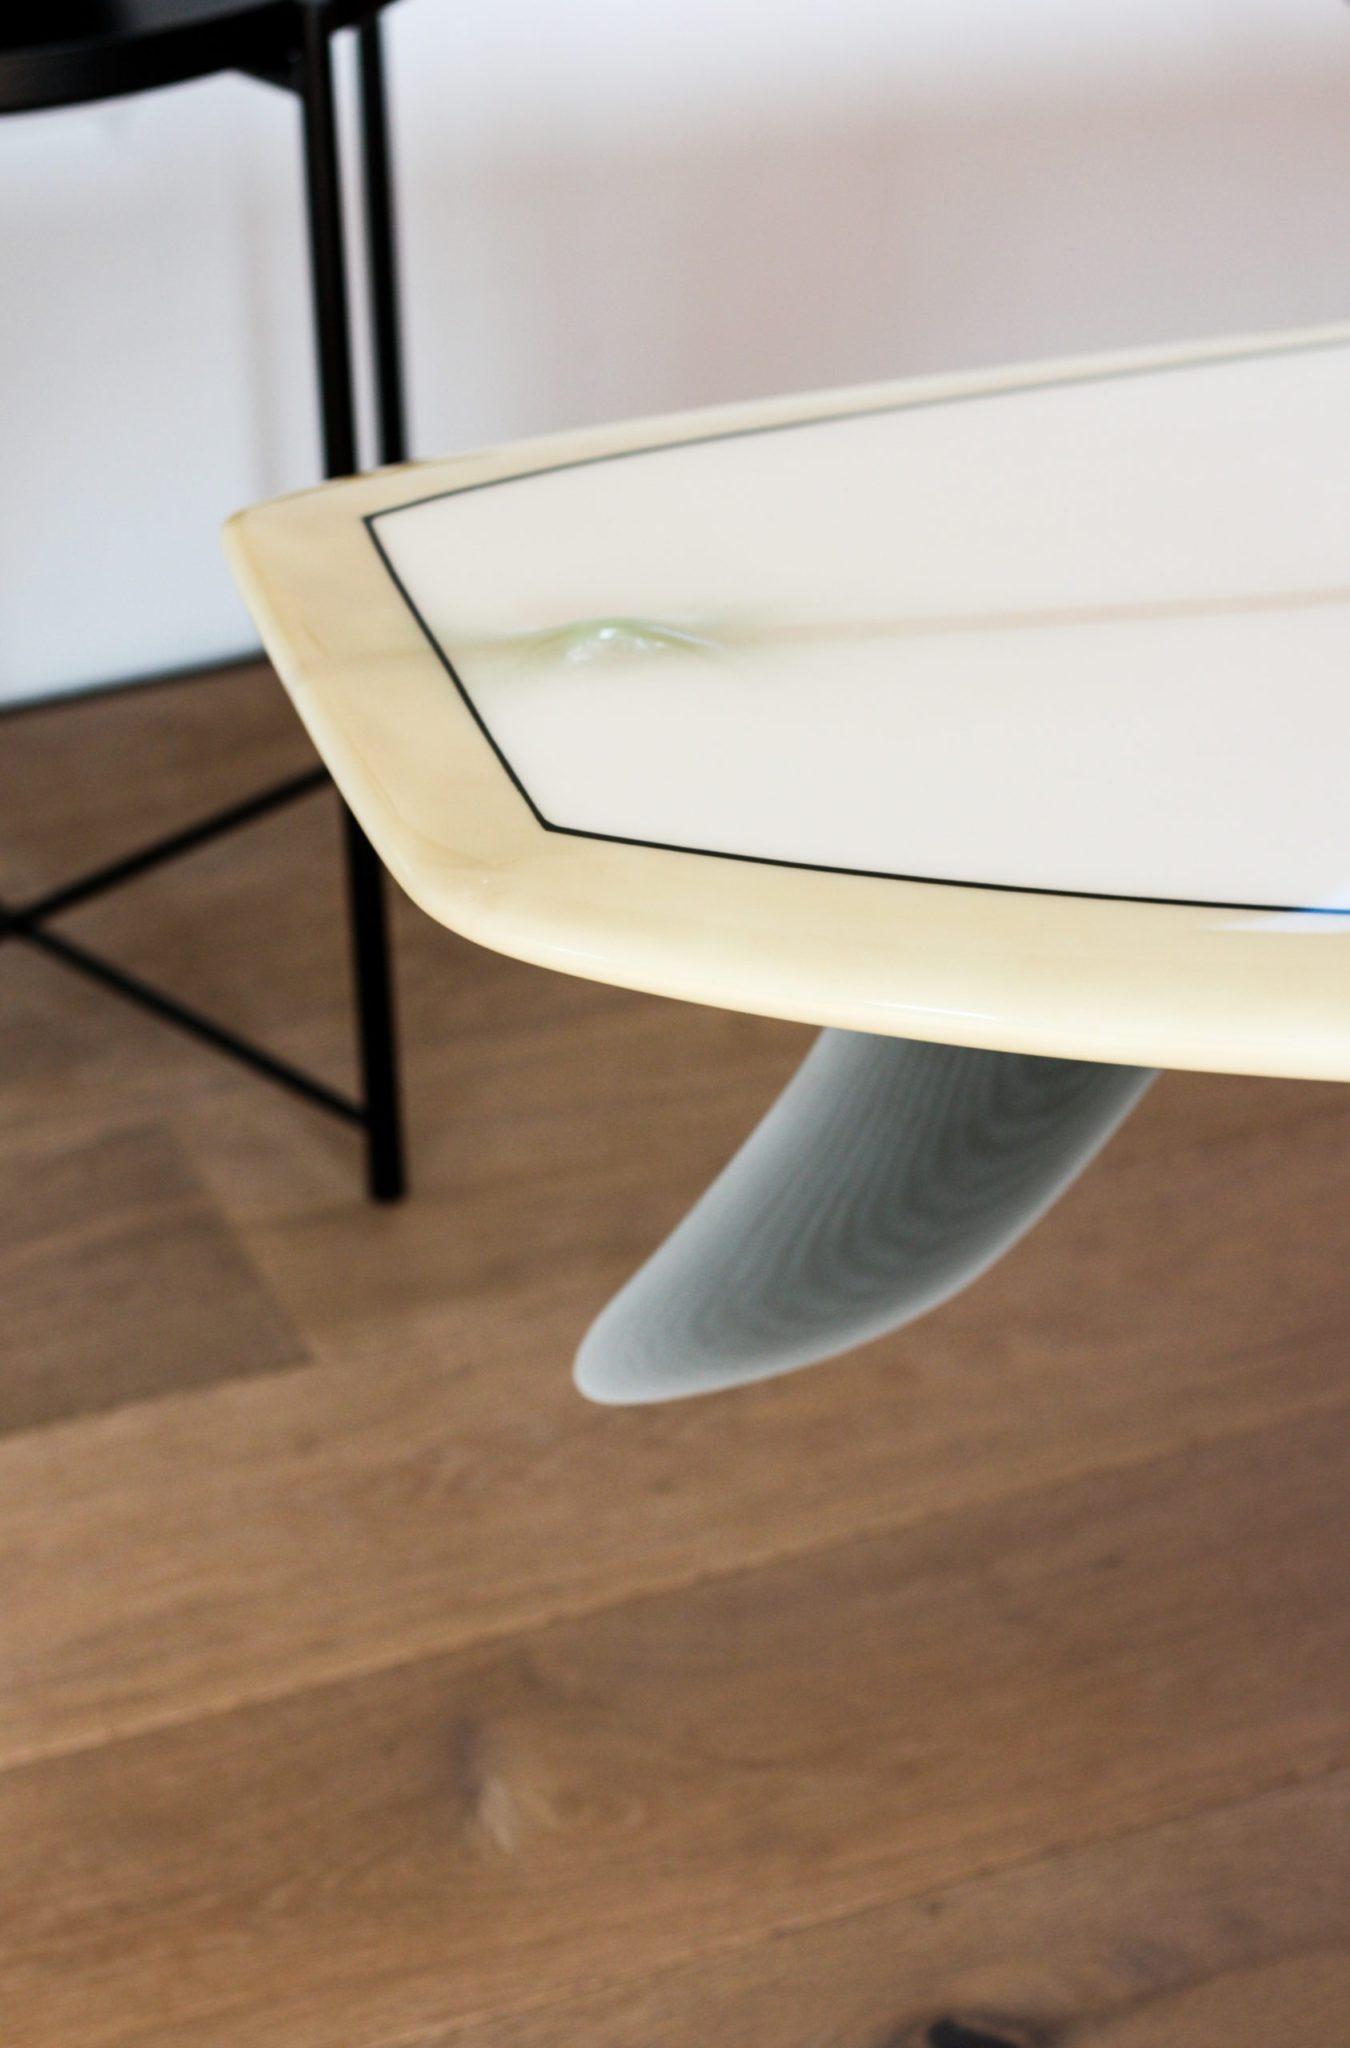 Cachalot Surfboards planche surf eps handmade artisan shaper hollow bois lauzin blunt